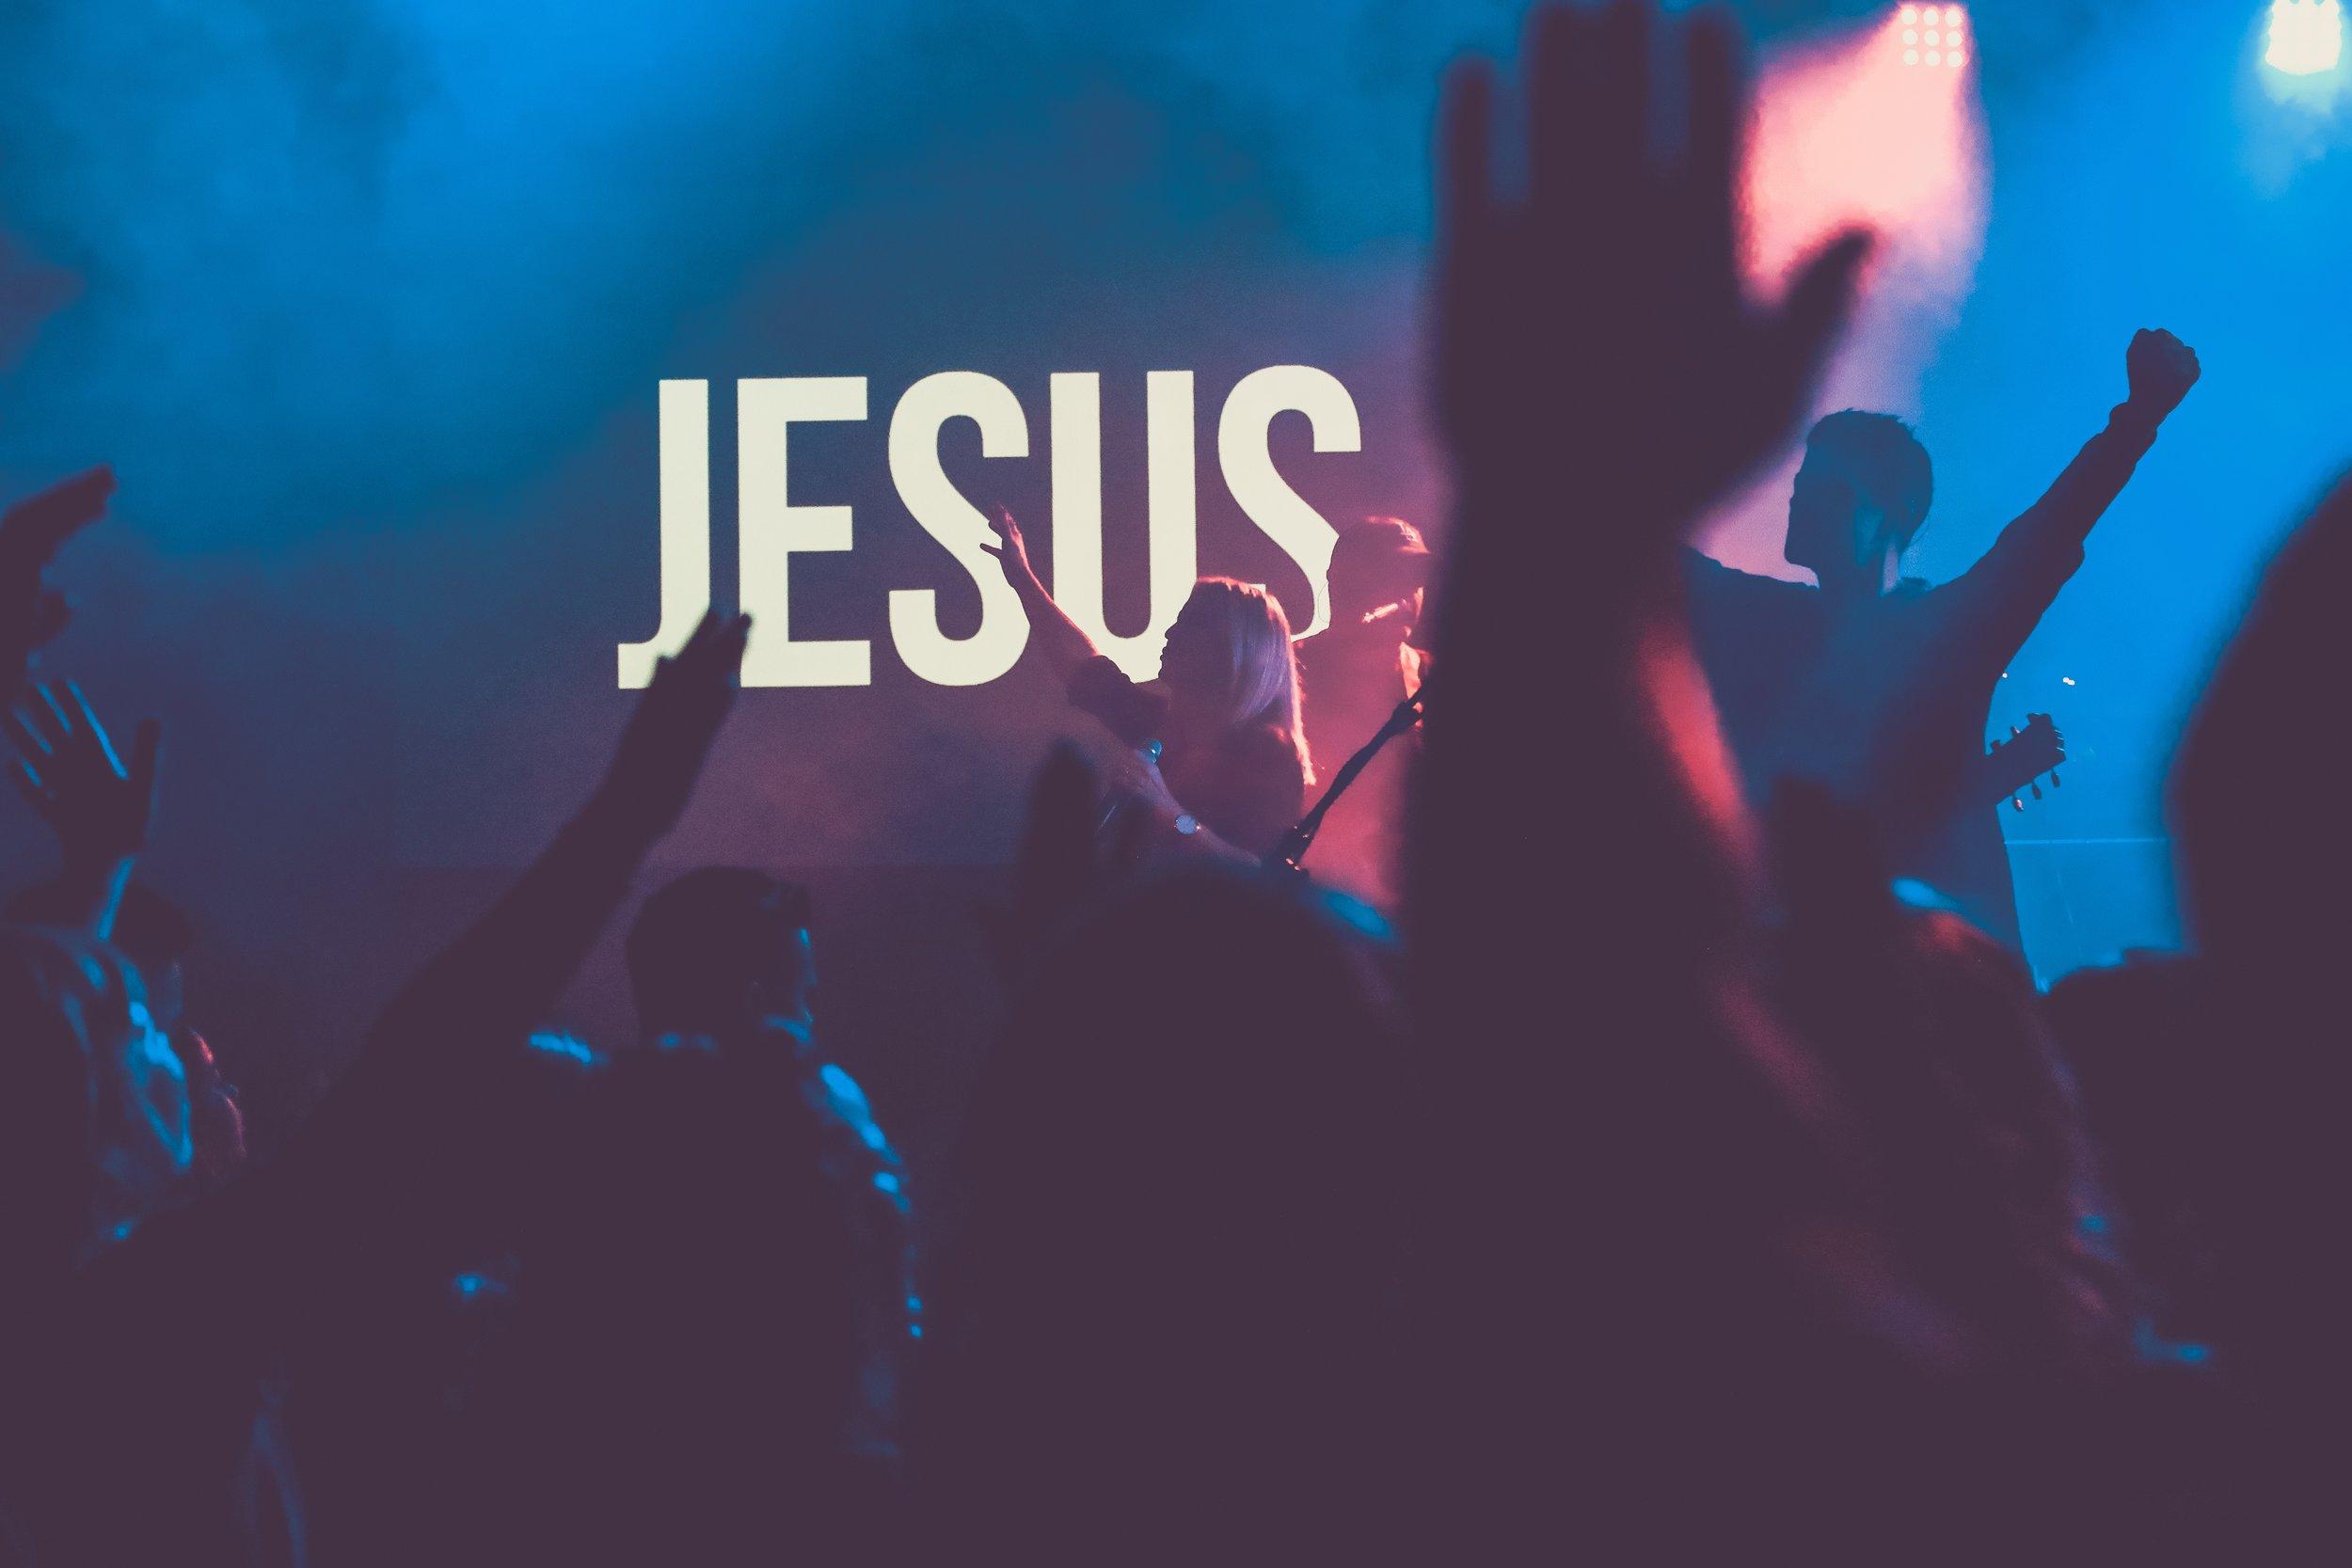 jesus-scars.png